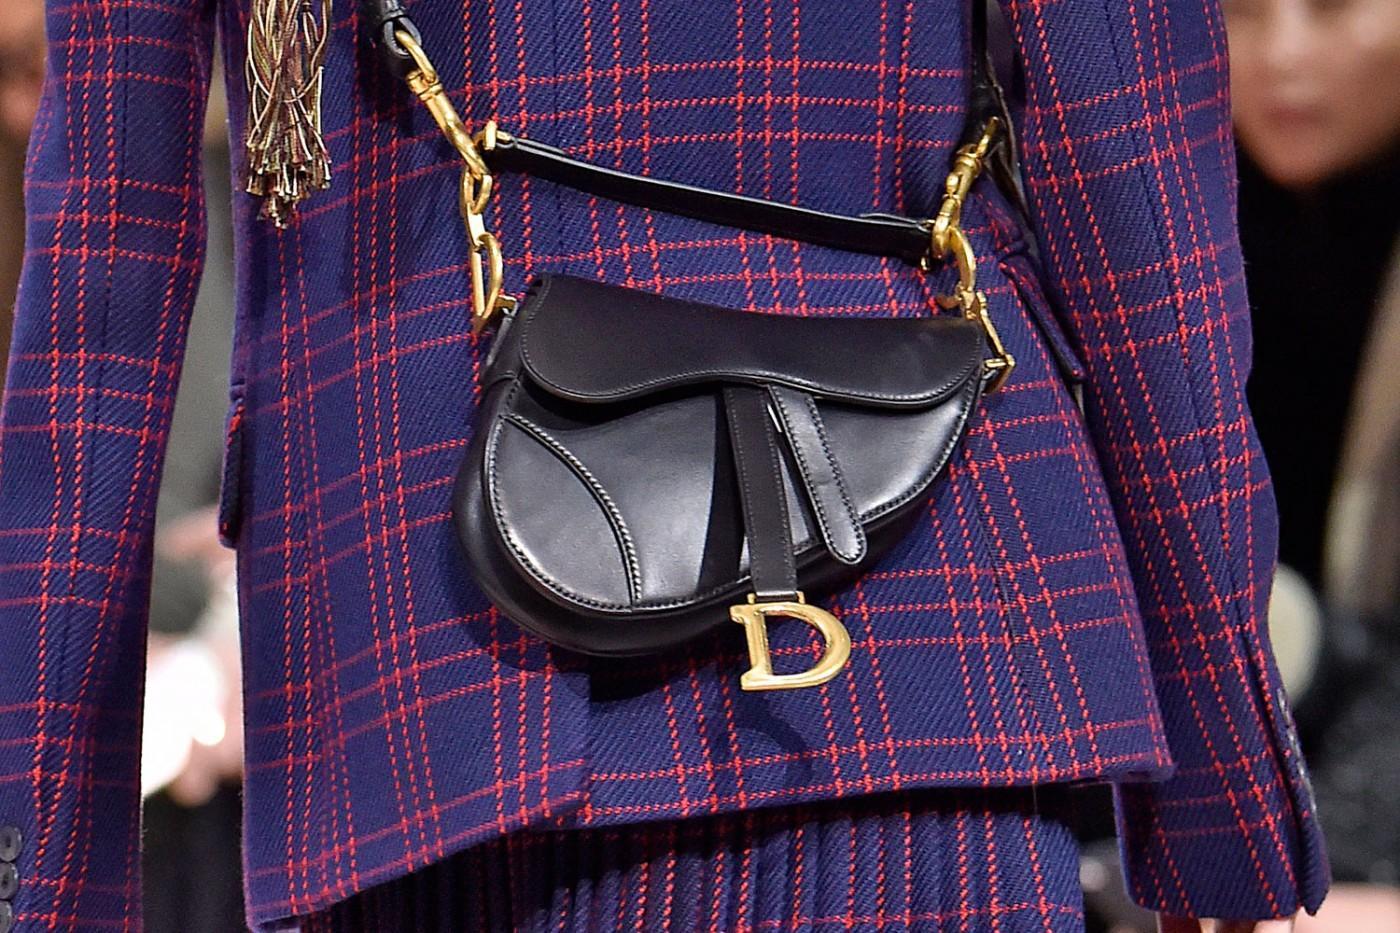 dior is bringing back the saddle bag  u2014 maria grazia chiuri resurrects a classic